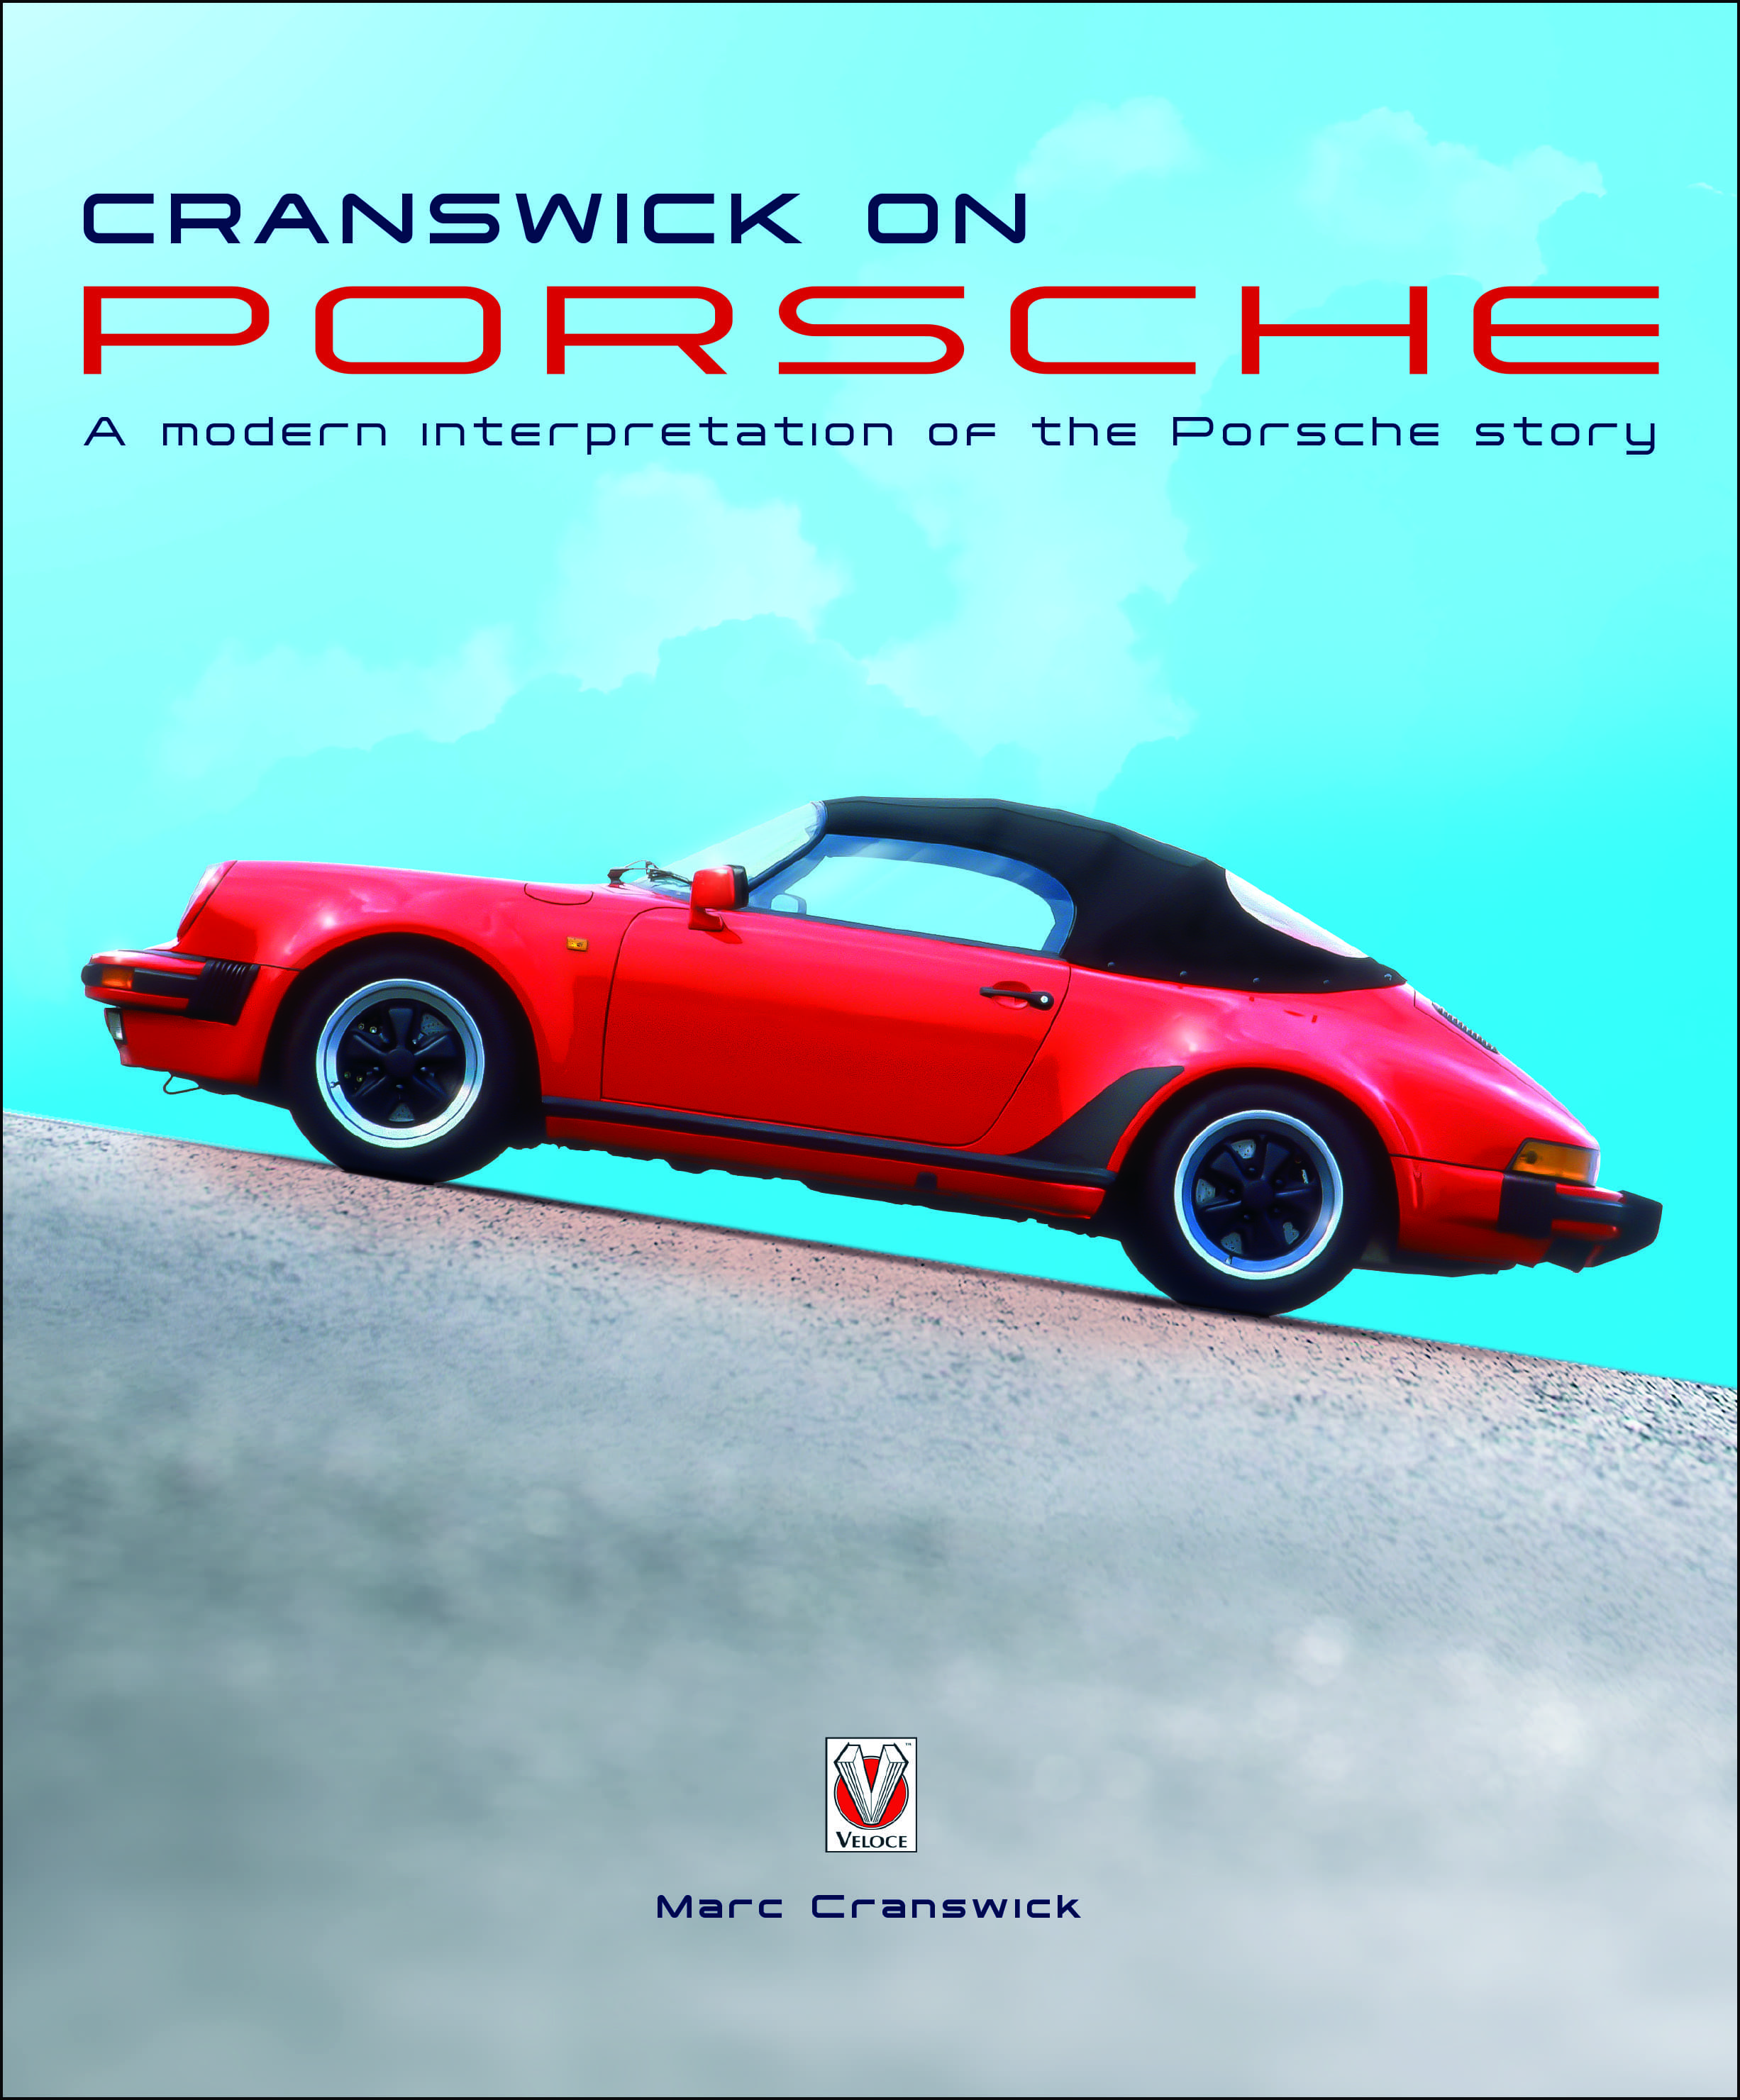 Cranswick on Porsche cover